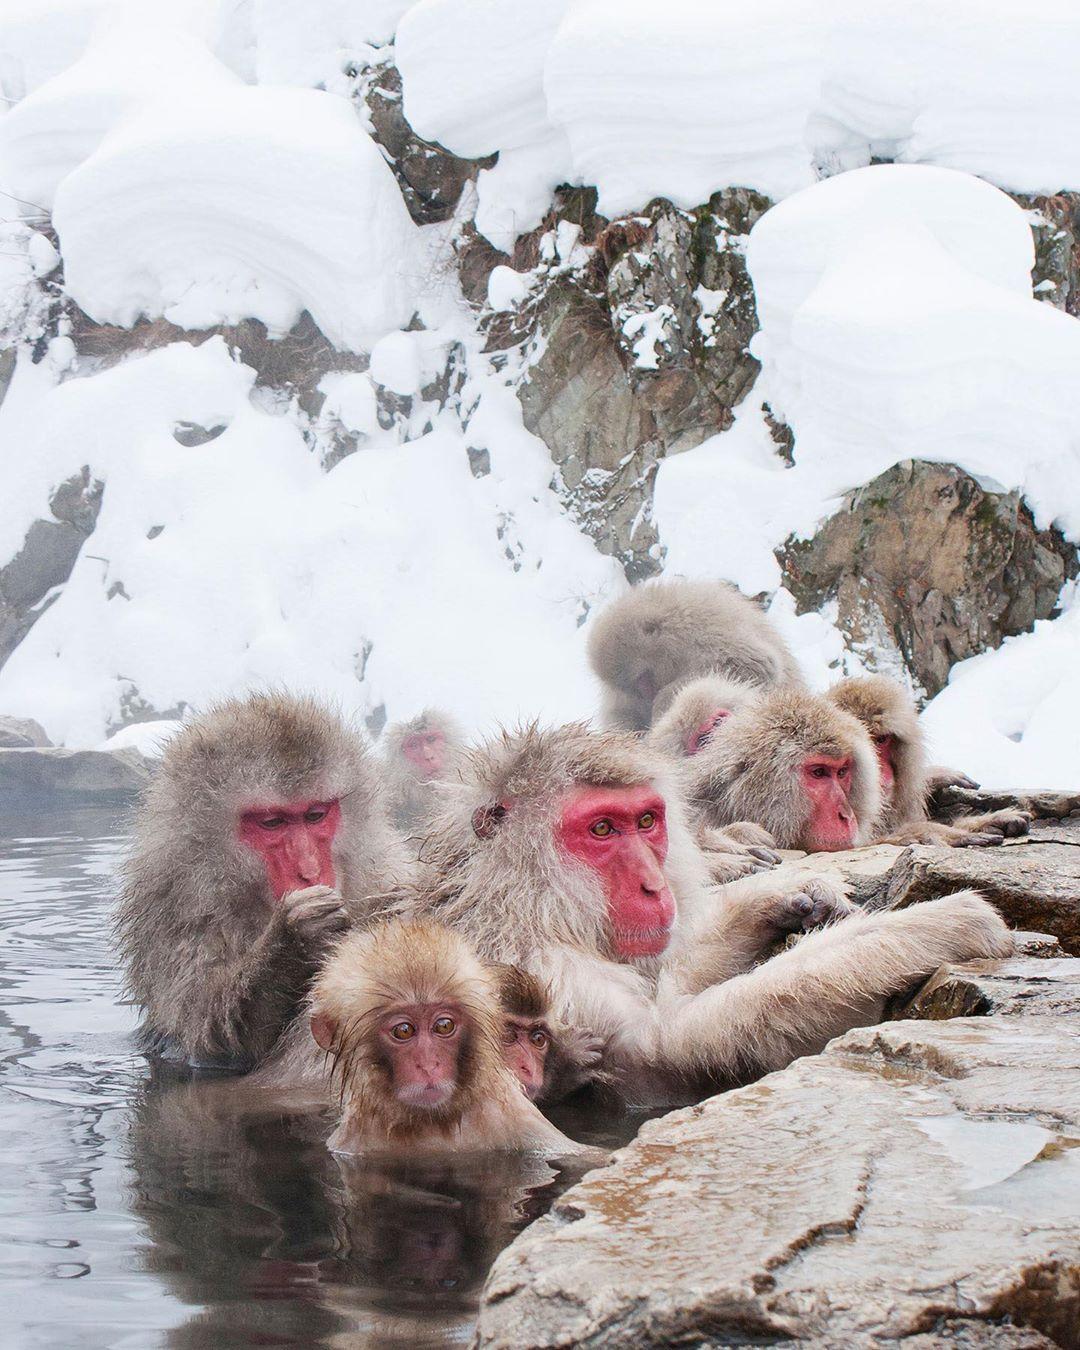 Snow Monkeys 01 Acrylglasbild 45 X 60 Cm 60 X 80 Cm Und 75 X 100 Cm Aussenmass Link In Bio Wandbild Birds Animals